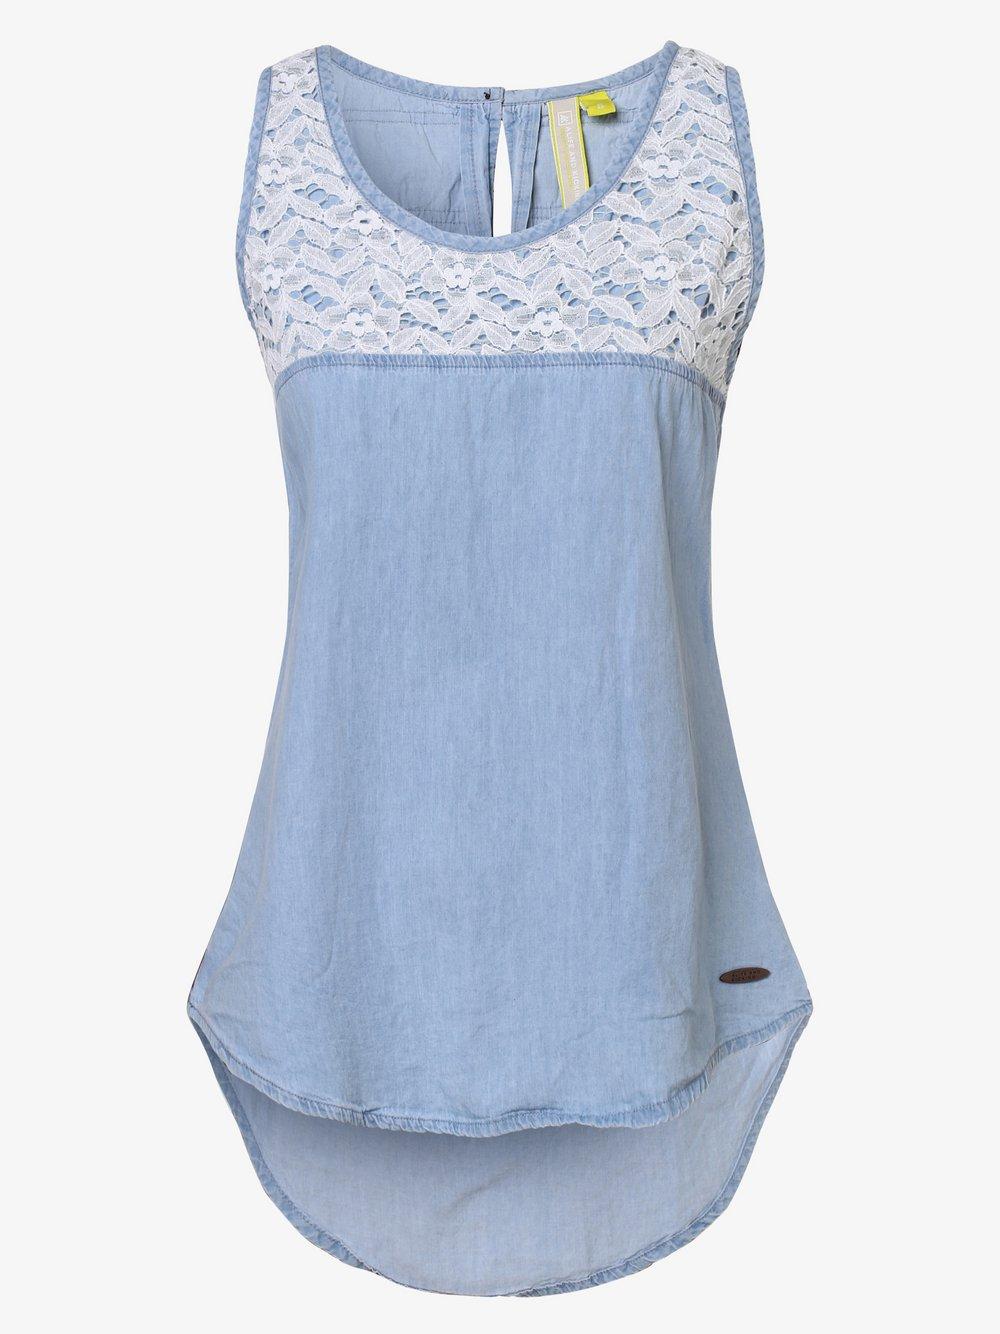 alife and kickin – Top damski – Carla, niebieski Van Graaf 469872-0001-09990